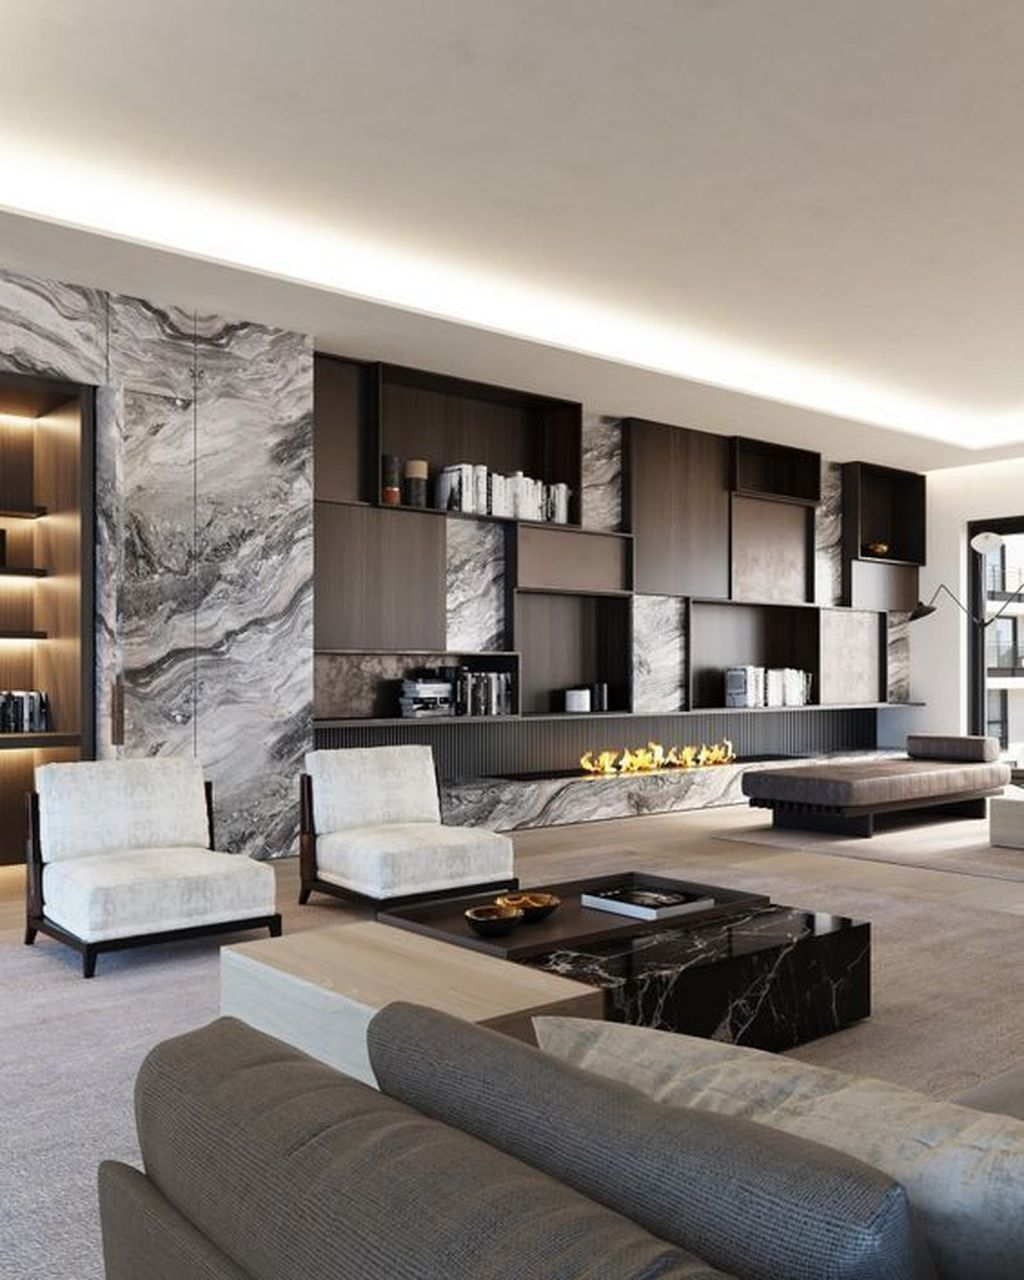 32 Admirable Mid Century Modern House Design Ideas Modern Mansion Interior Modern Houses Interior Living Room Design Modern